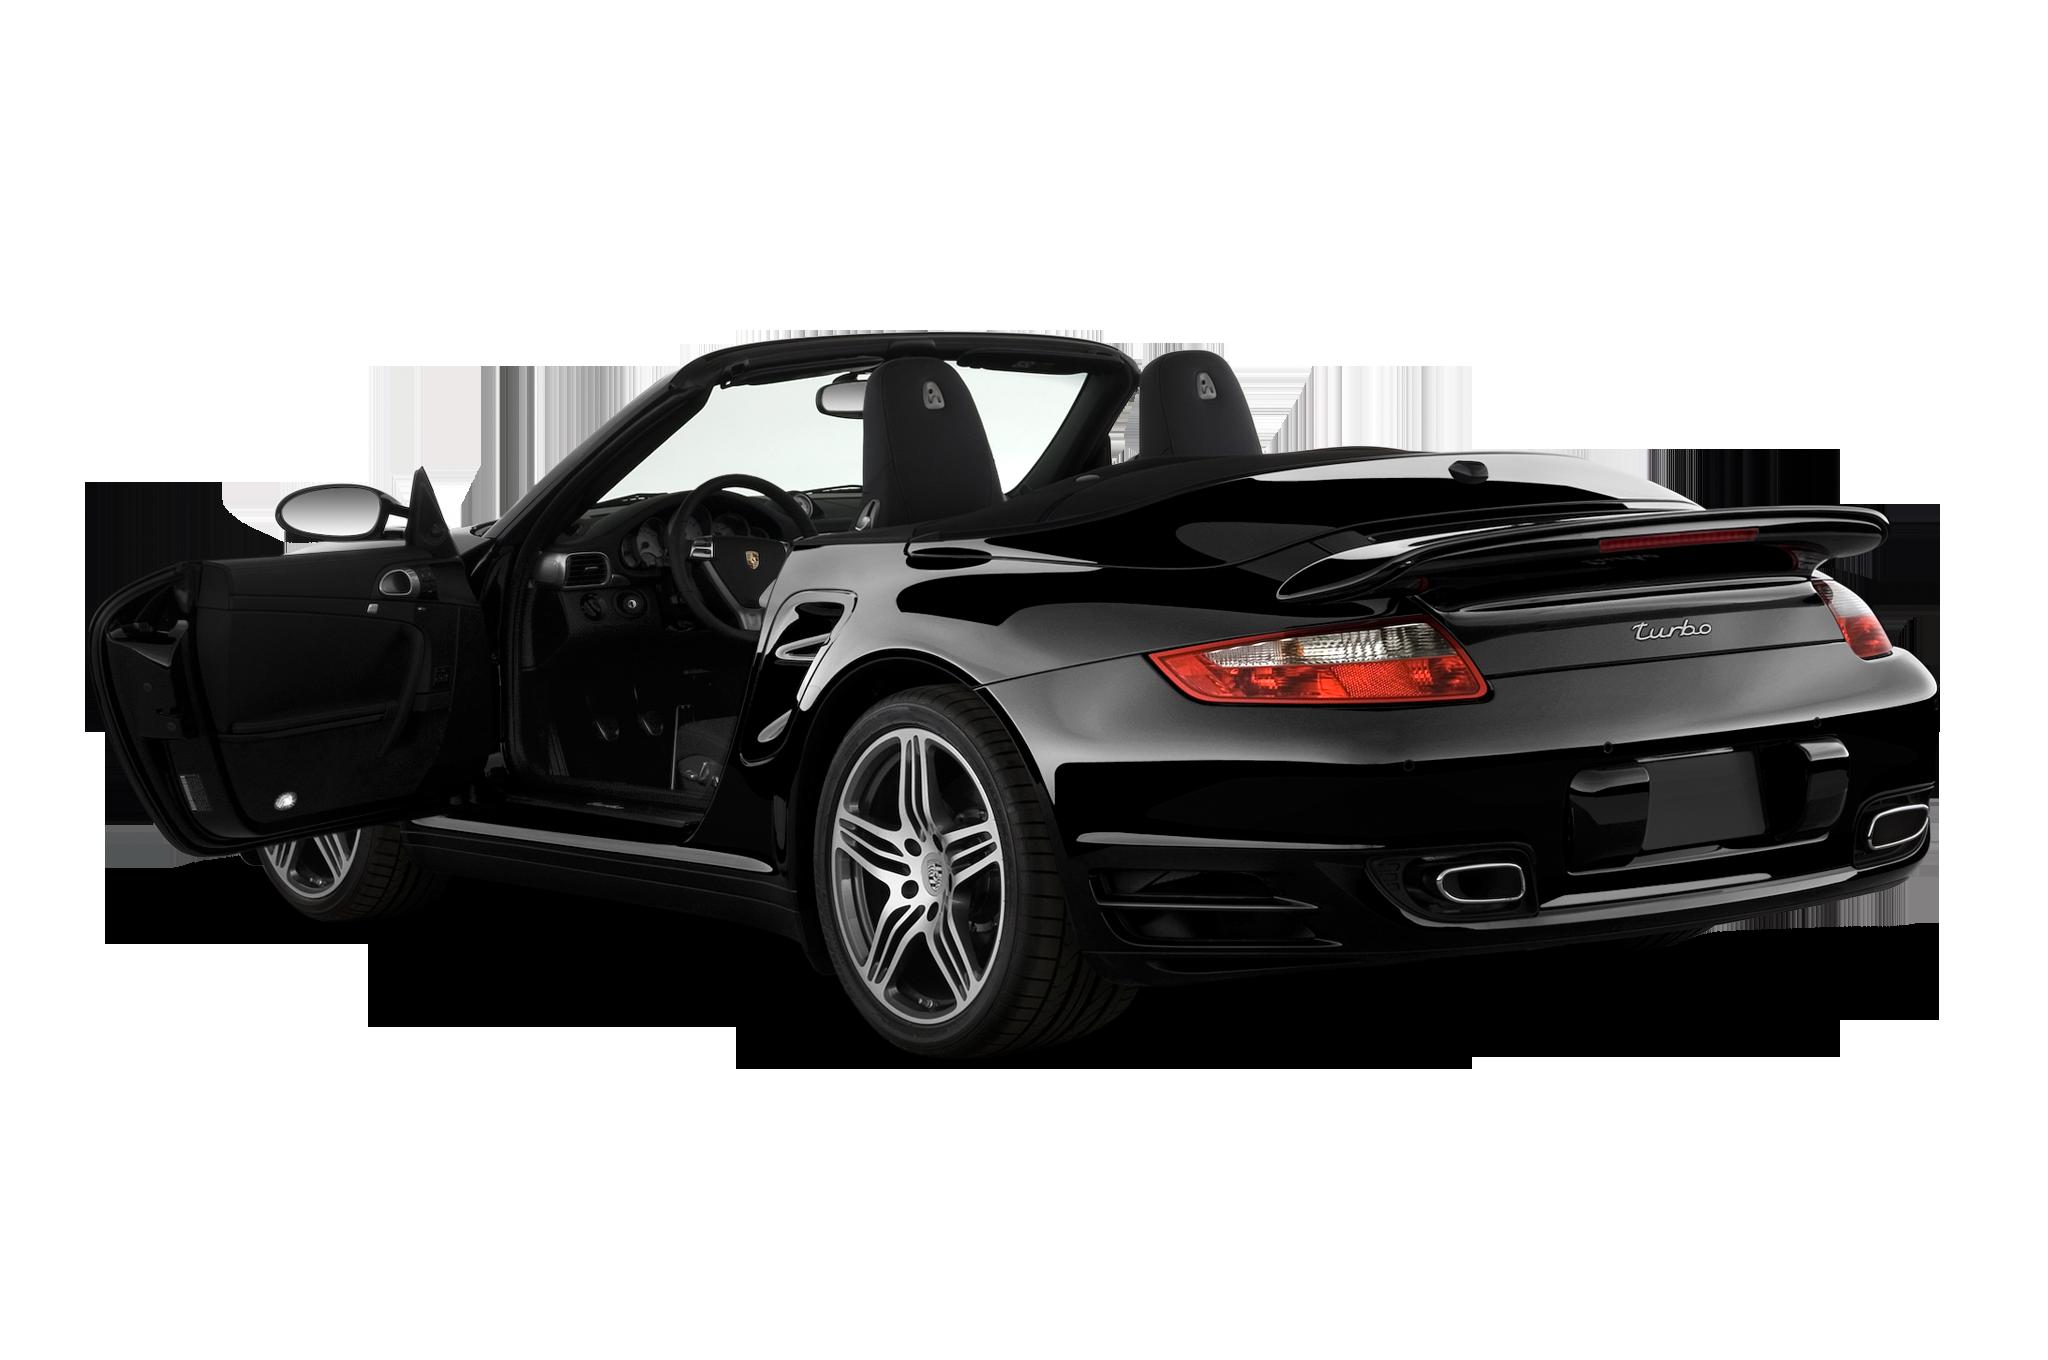 2010 porsche 911 turbo porsche sport coupe review automobile magazine. Black Bedroom Furniture Sets. Home Design Ideas